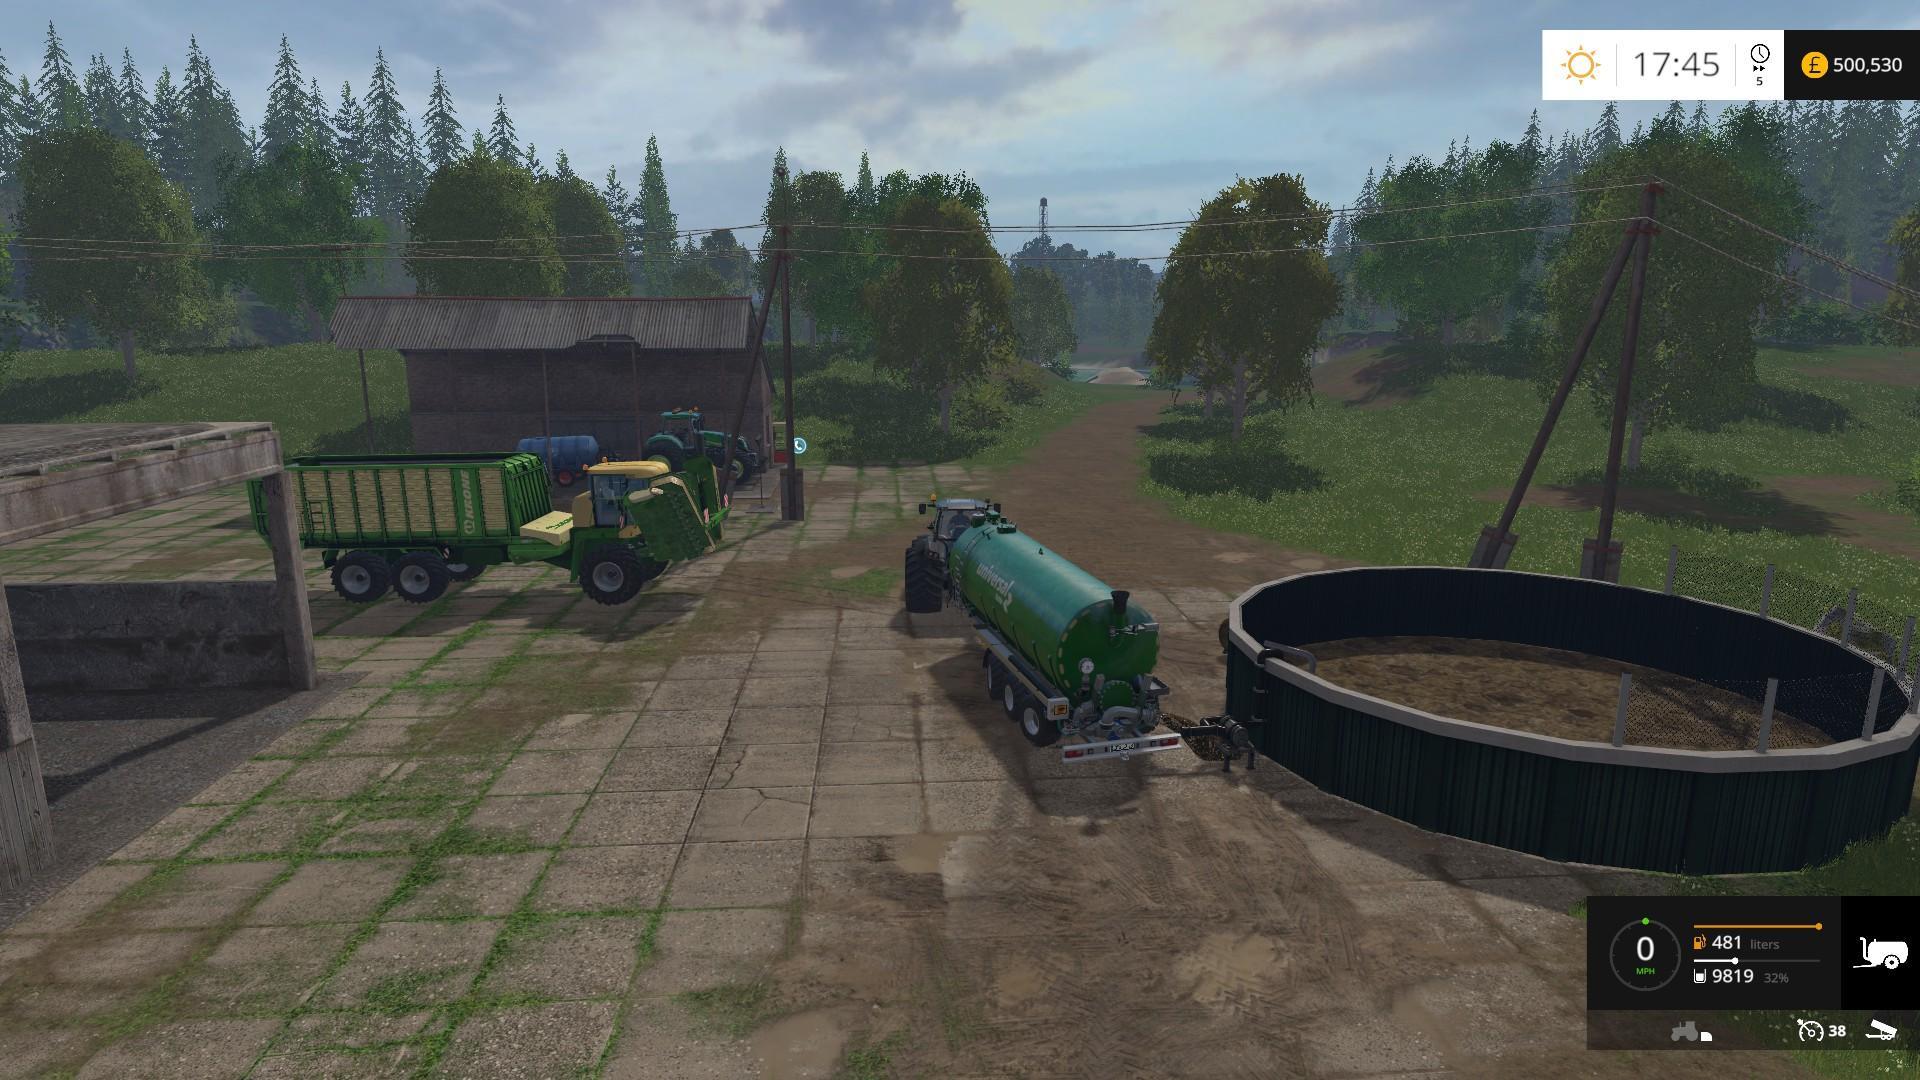 STORAGE Archives • Farming simulator 19, 17, 15 mods | FS19